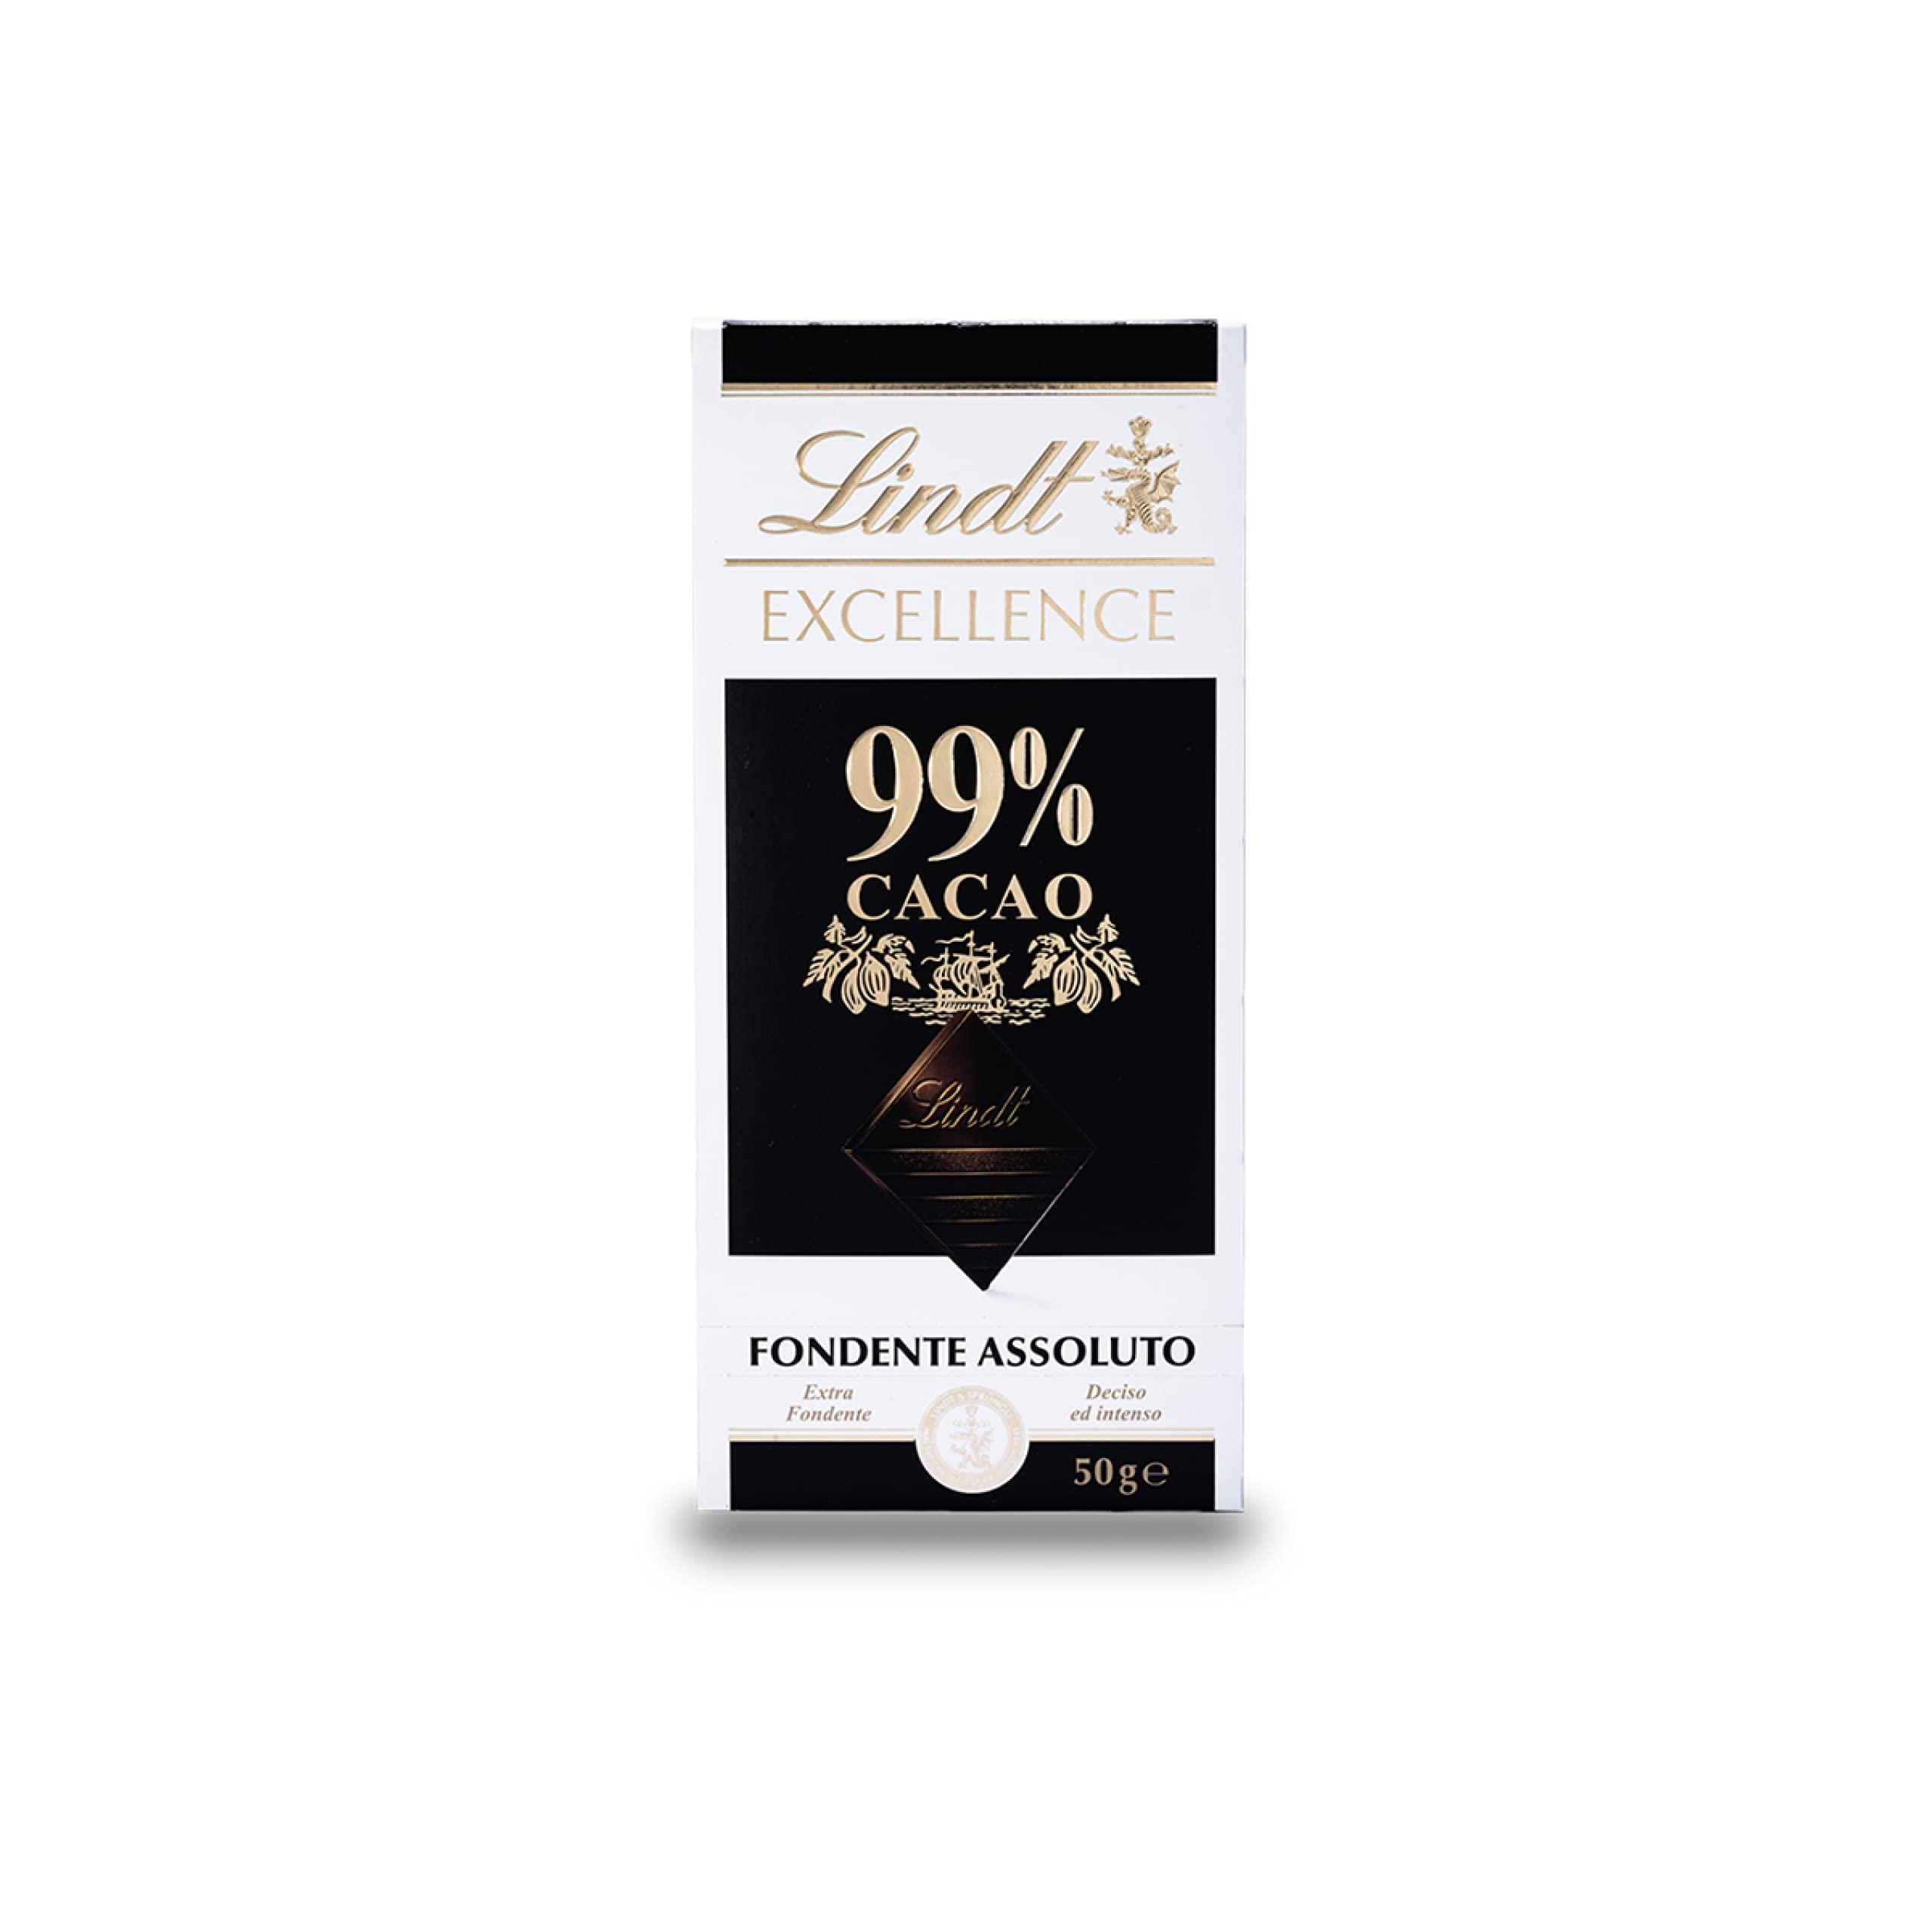 Lindt - Excellence - Dark 99% - 50g